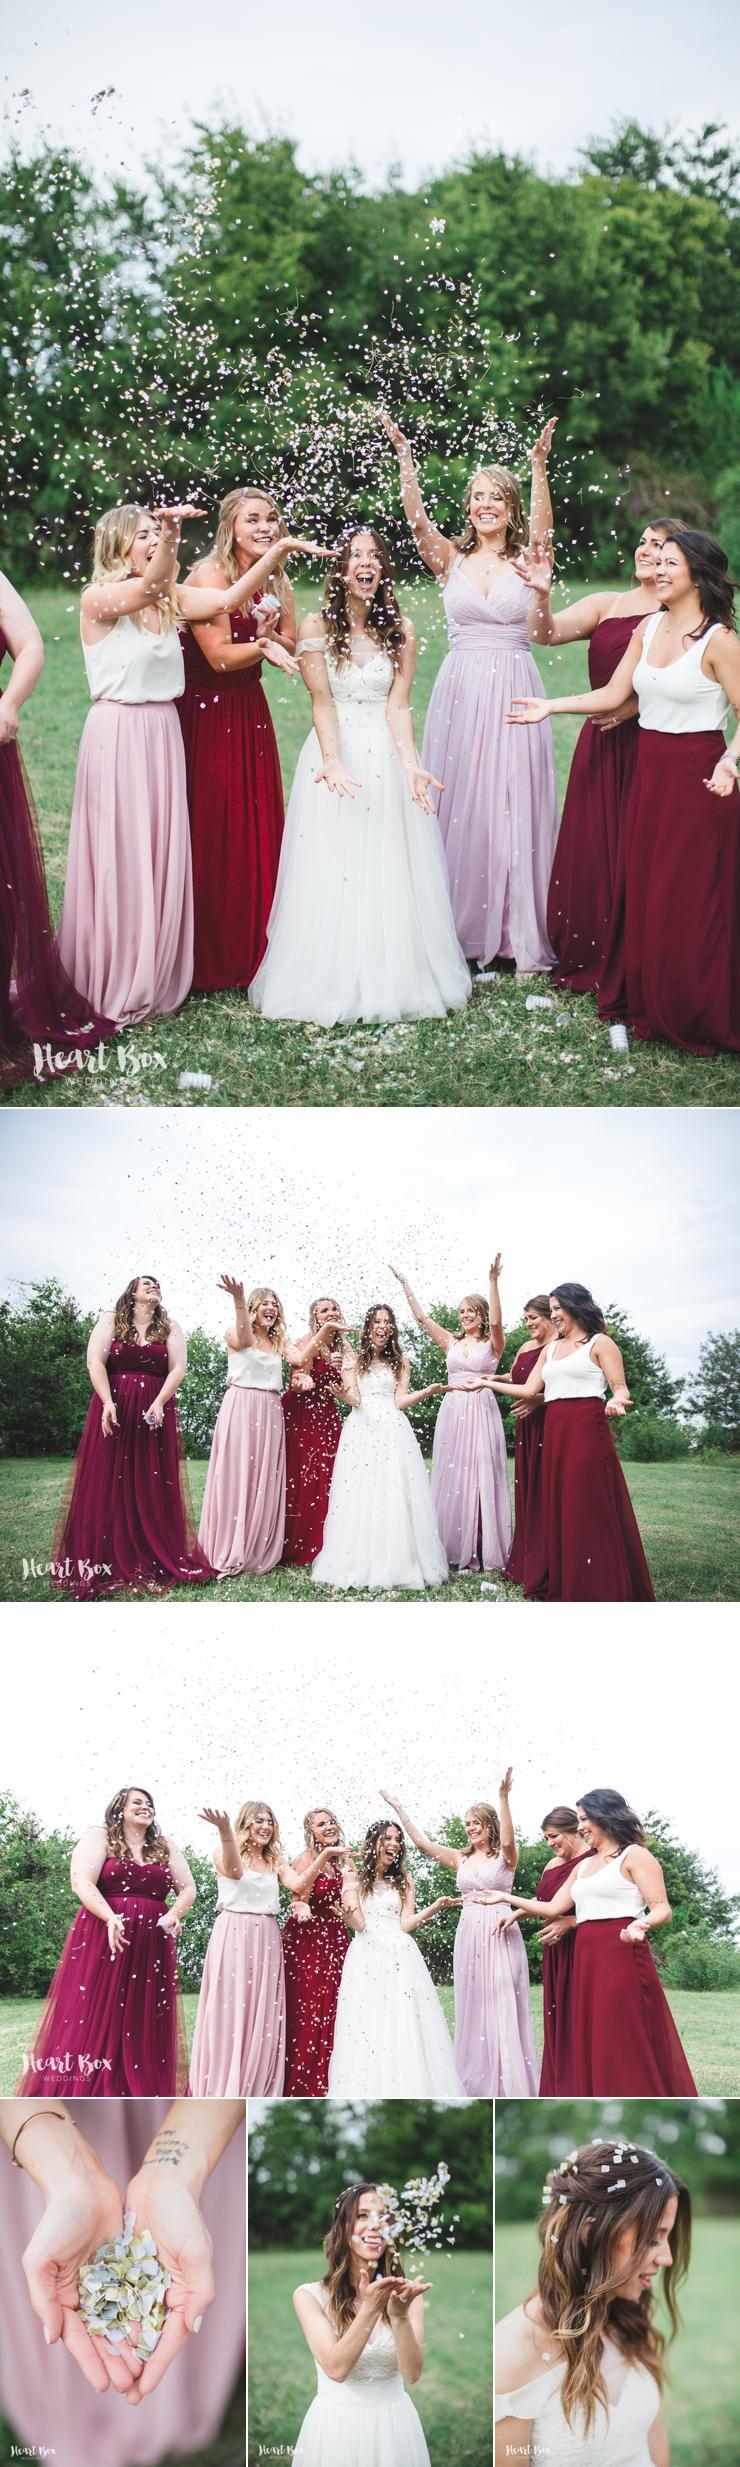 Hicks Wedding 13.jpg